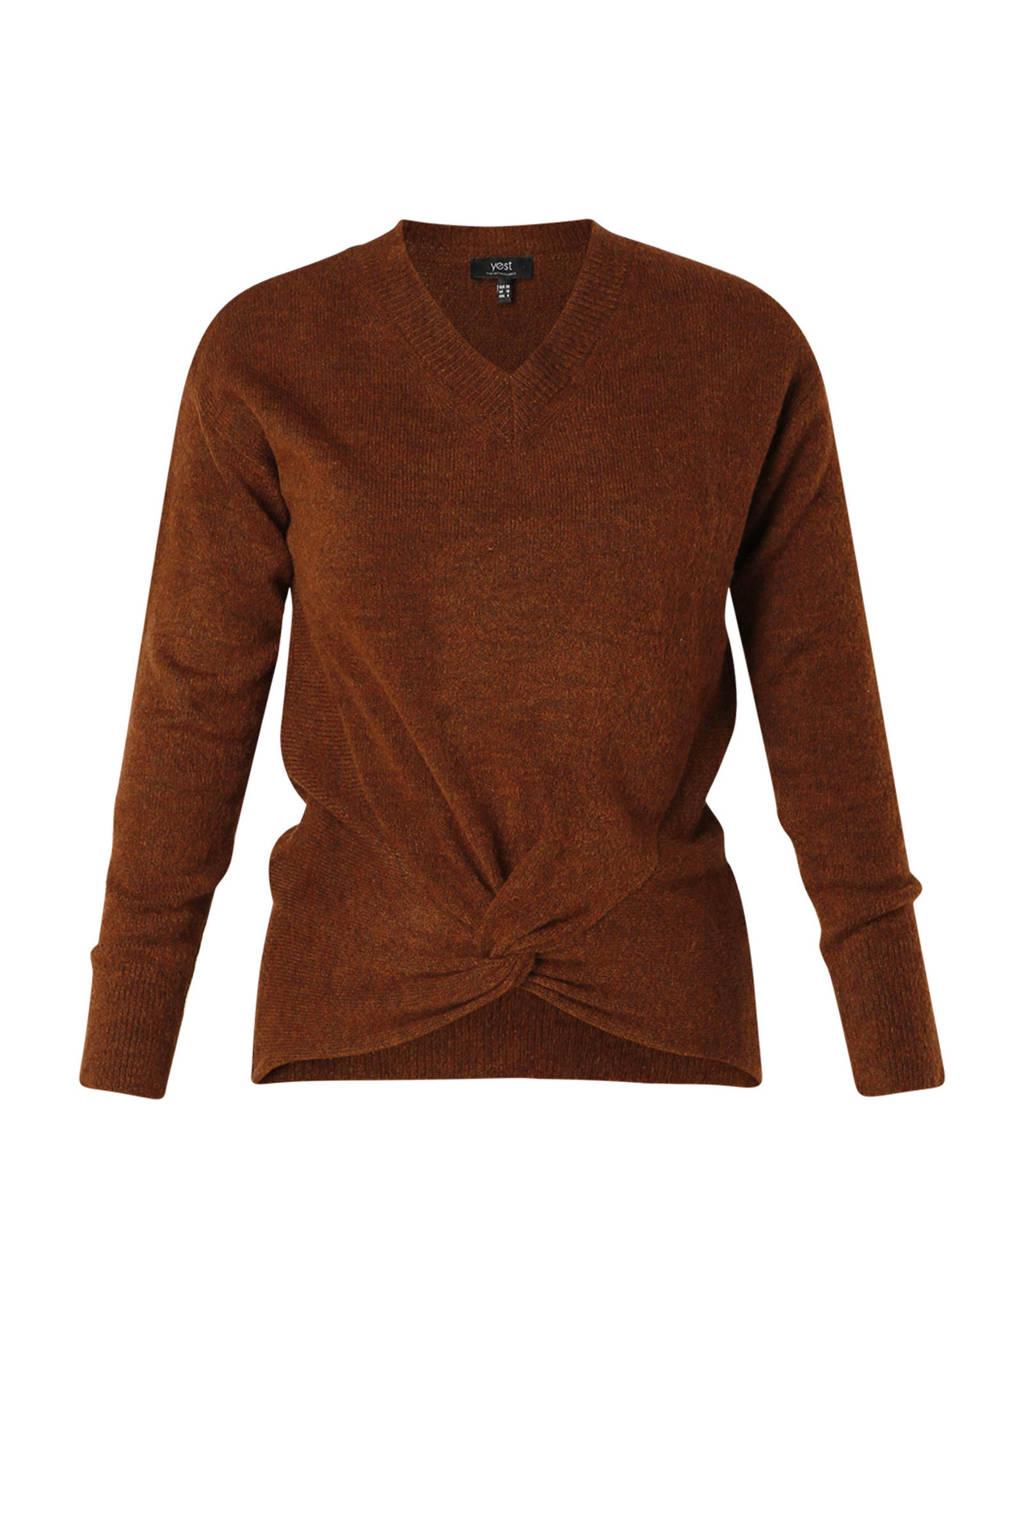 Yest gemêleerde fijngebreide trui Carolina roodbruin, Roodbruin